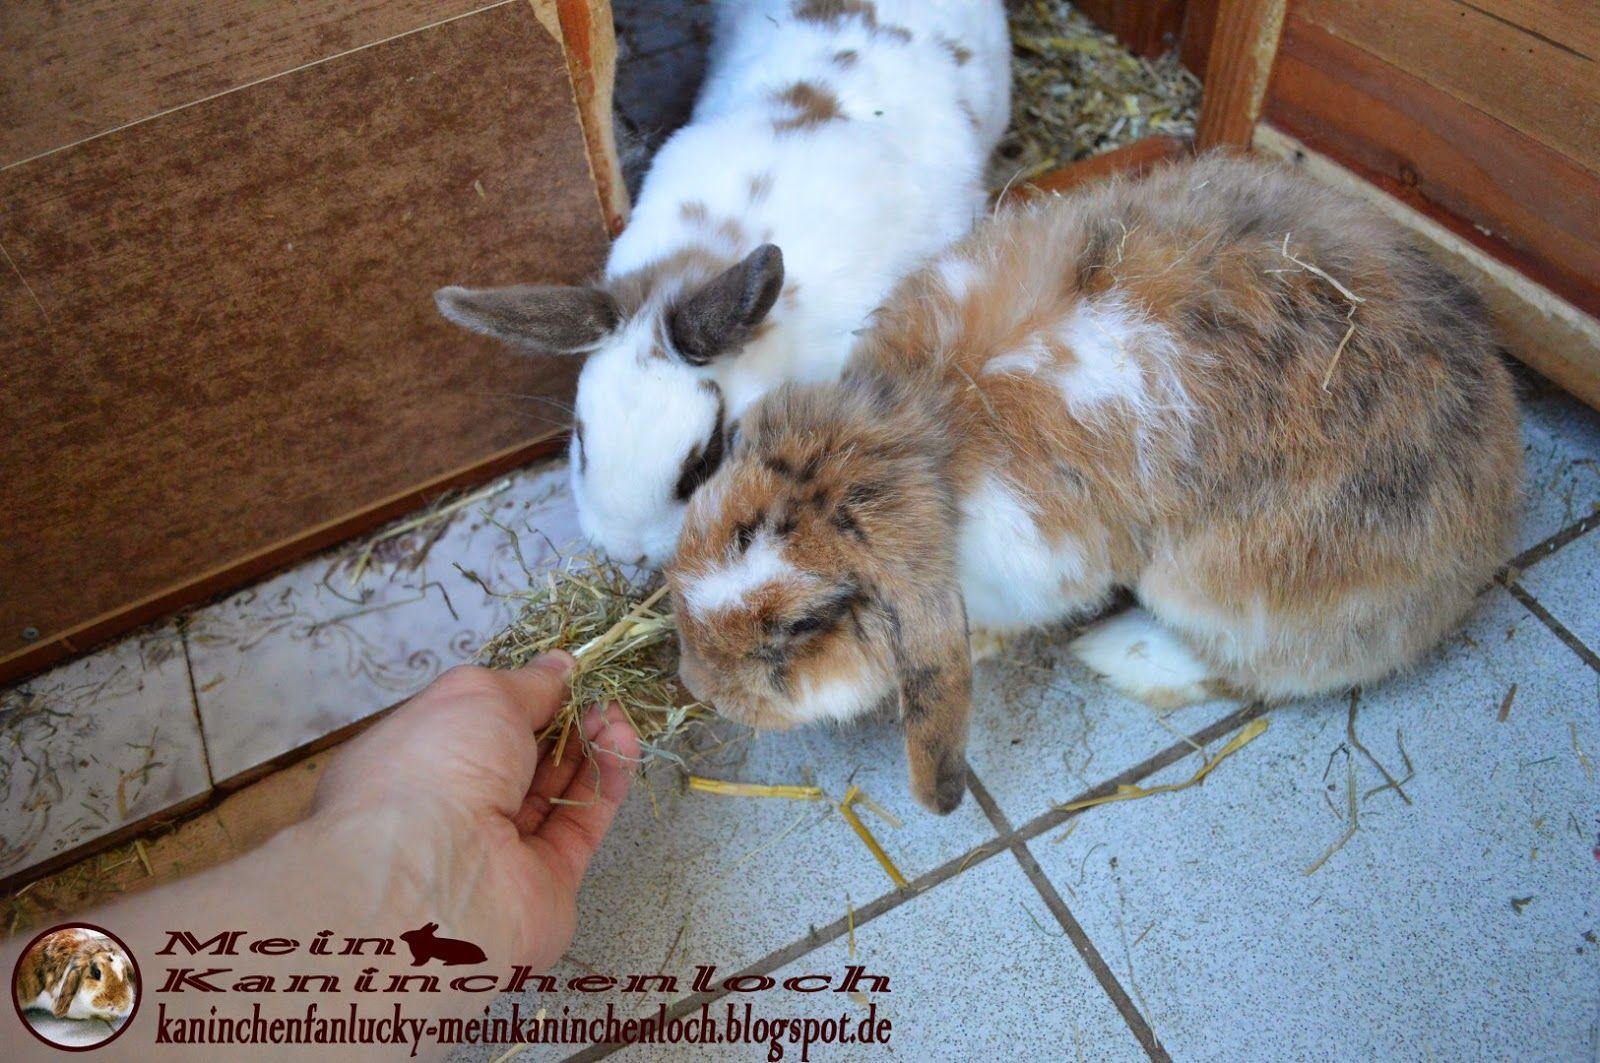 Kaninchenfan Lucky - Mein Kaninchenloch: Snow is already awake and half asleep Bella eats hay ♡  #kaninchen #rabbits #hasen #lapin #hare #karnickel #pets #haustiere   http://kaninchenfanlucky-meinkaninchenloch.blogspot.de/2014/08/snow-is-already-awake-and-half-asleep.html